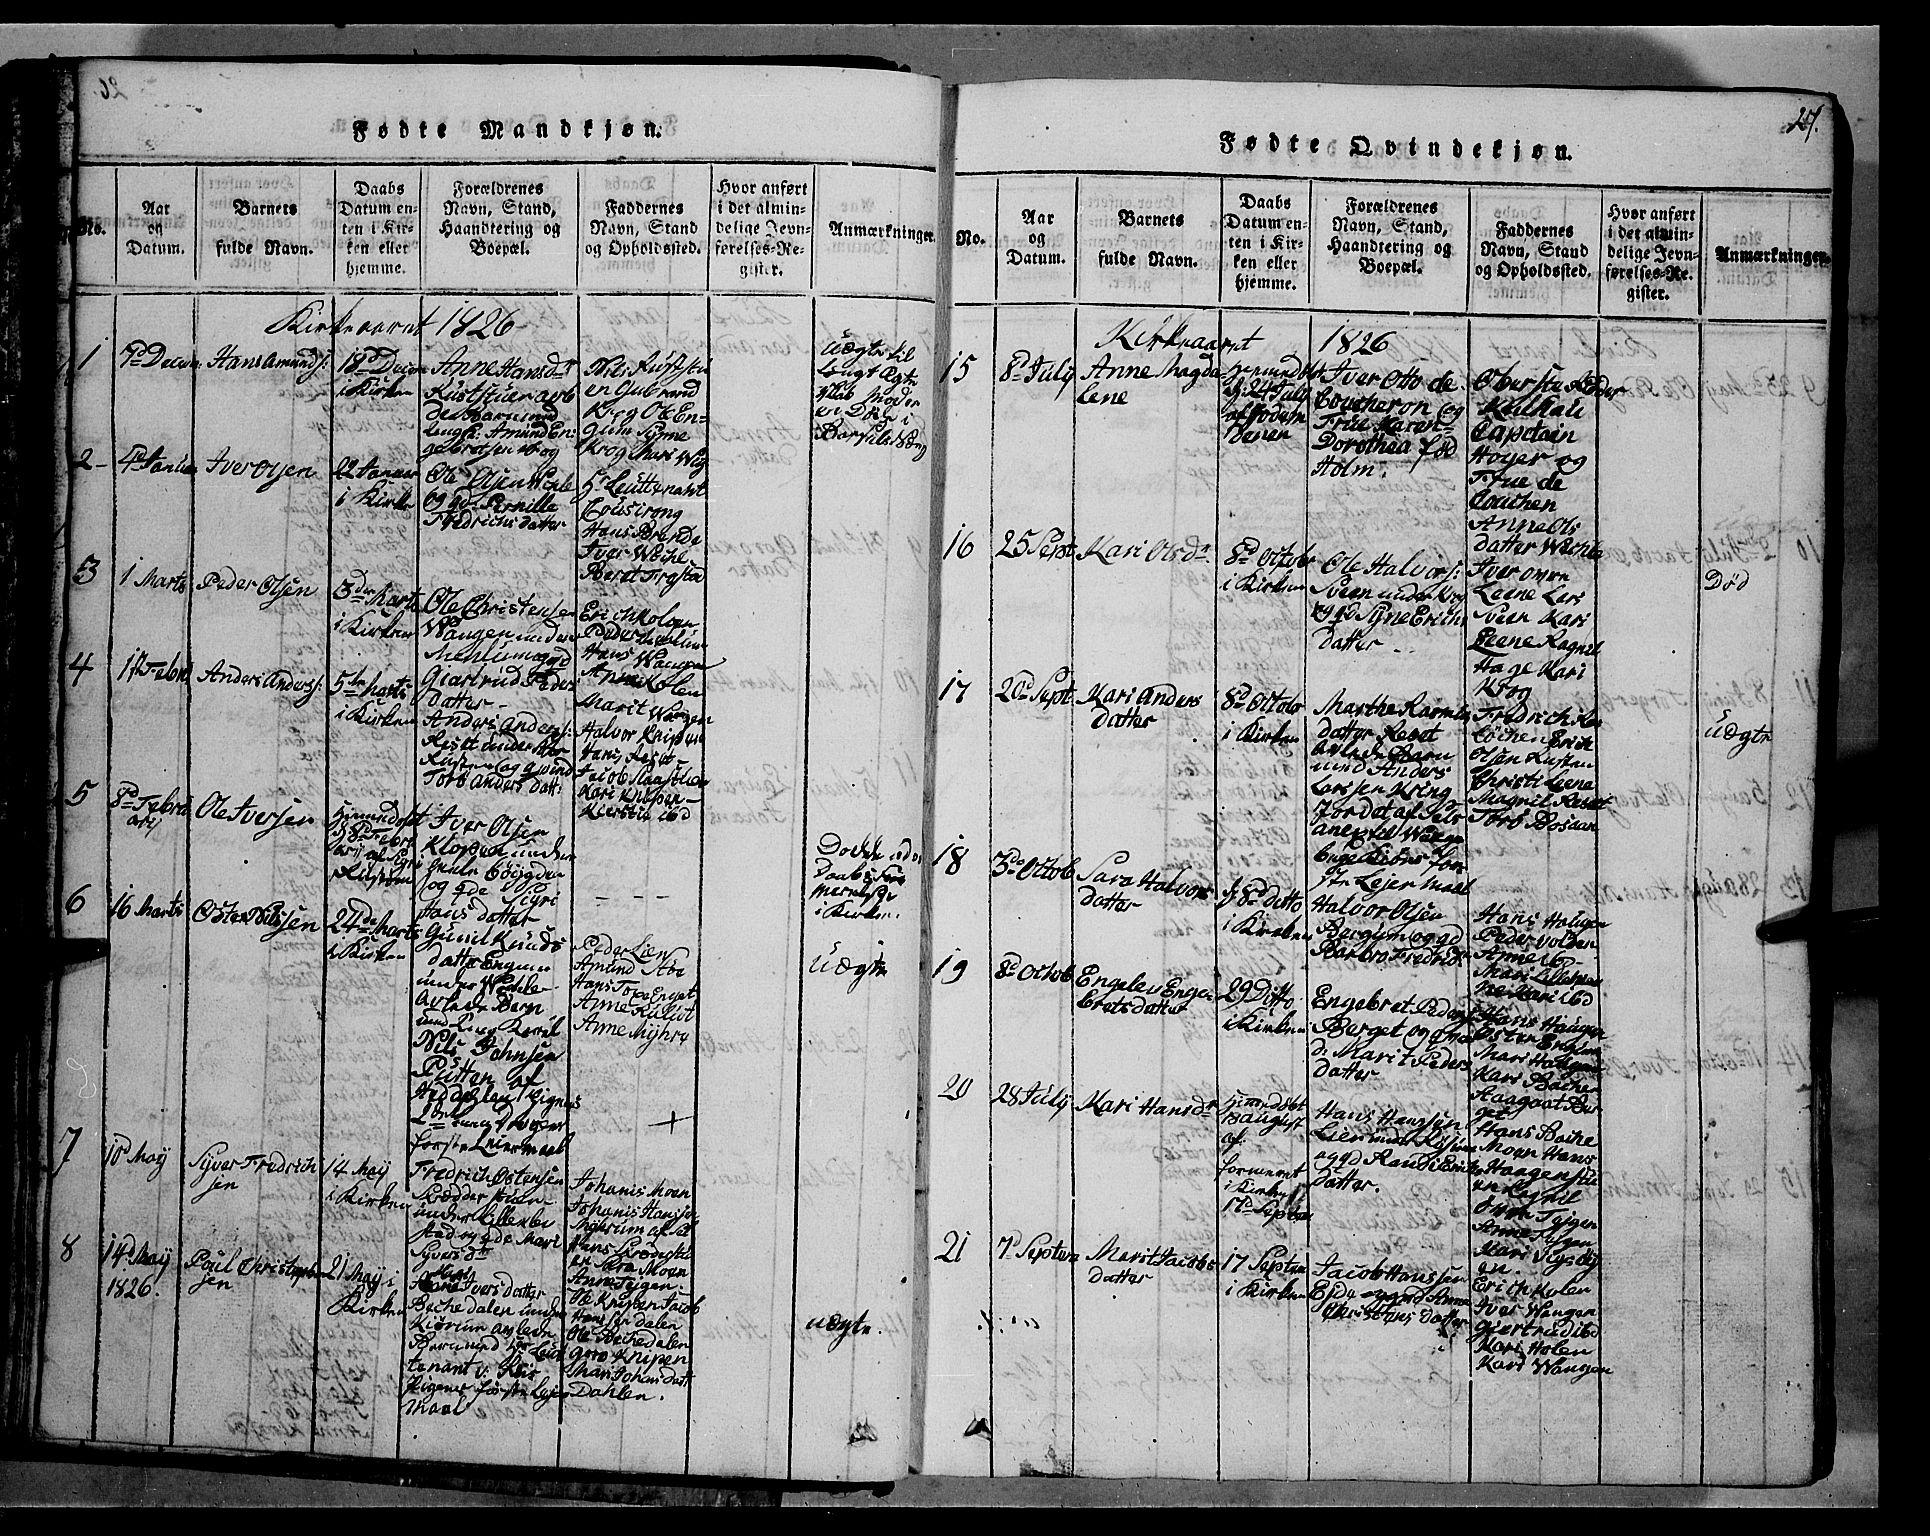 SAH, Fron prestekontor, H/Ha/Hab/L0002: Klokkerbok nr. 2, 1816-1850, s. 27